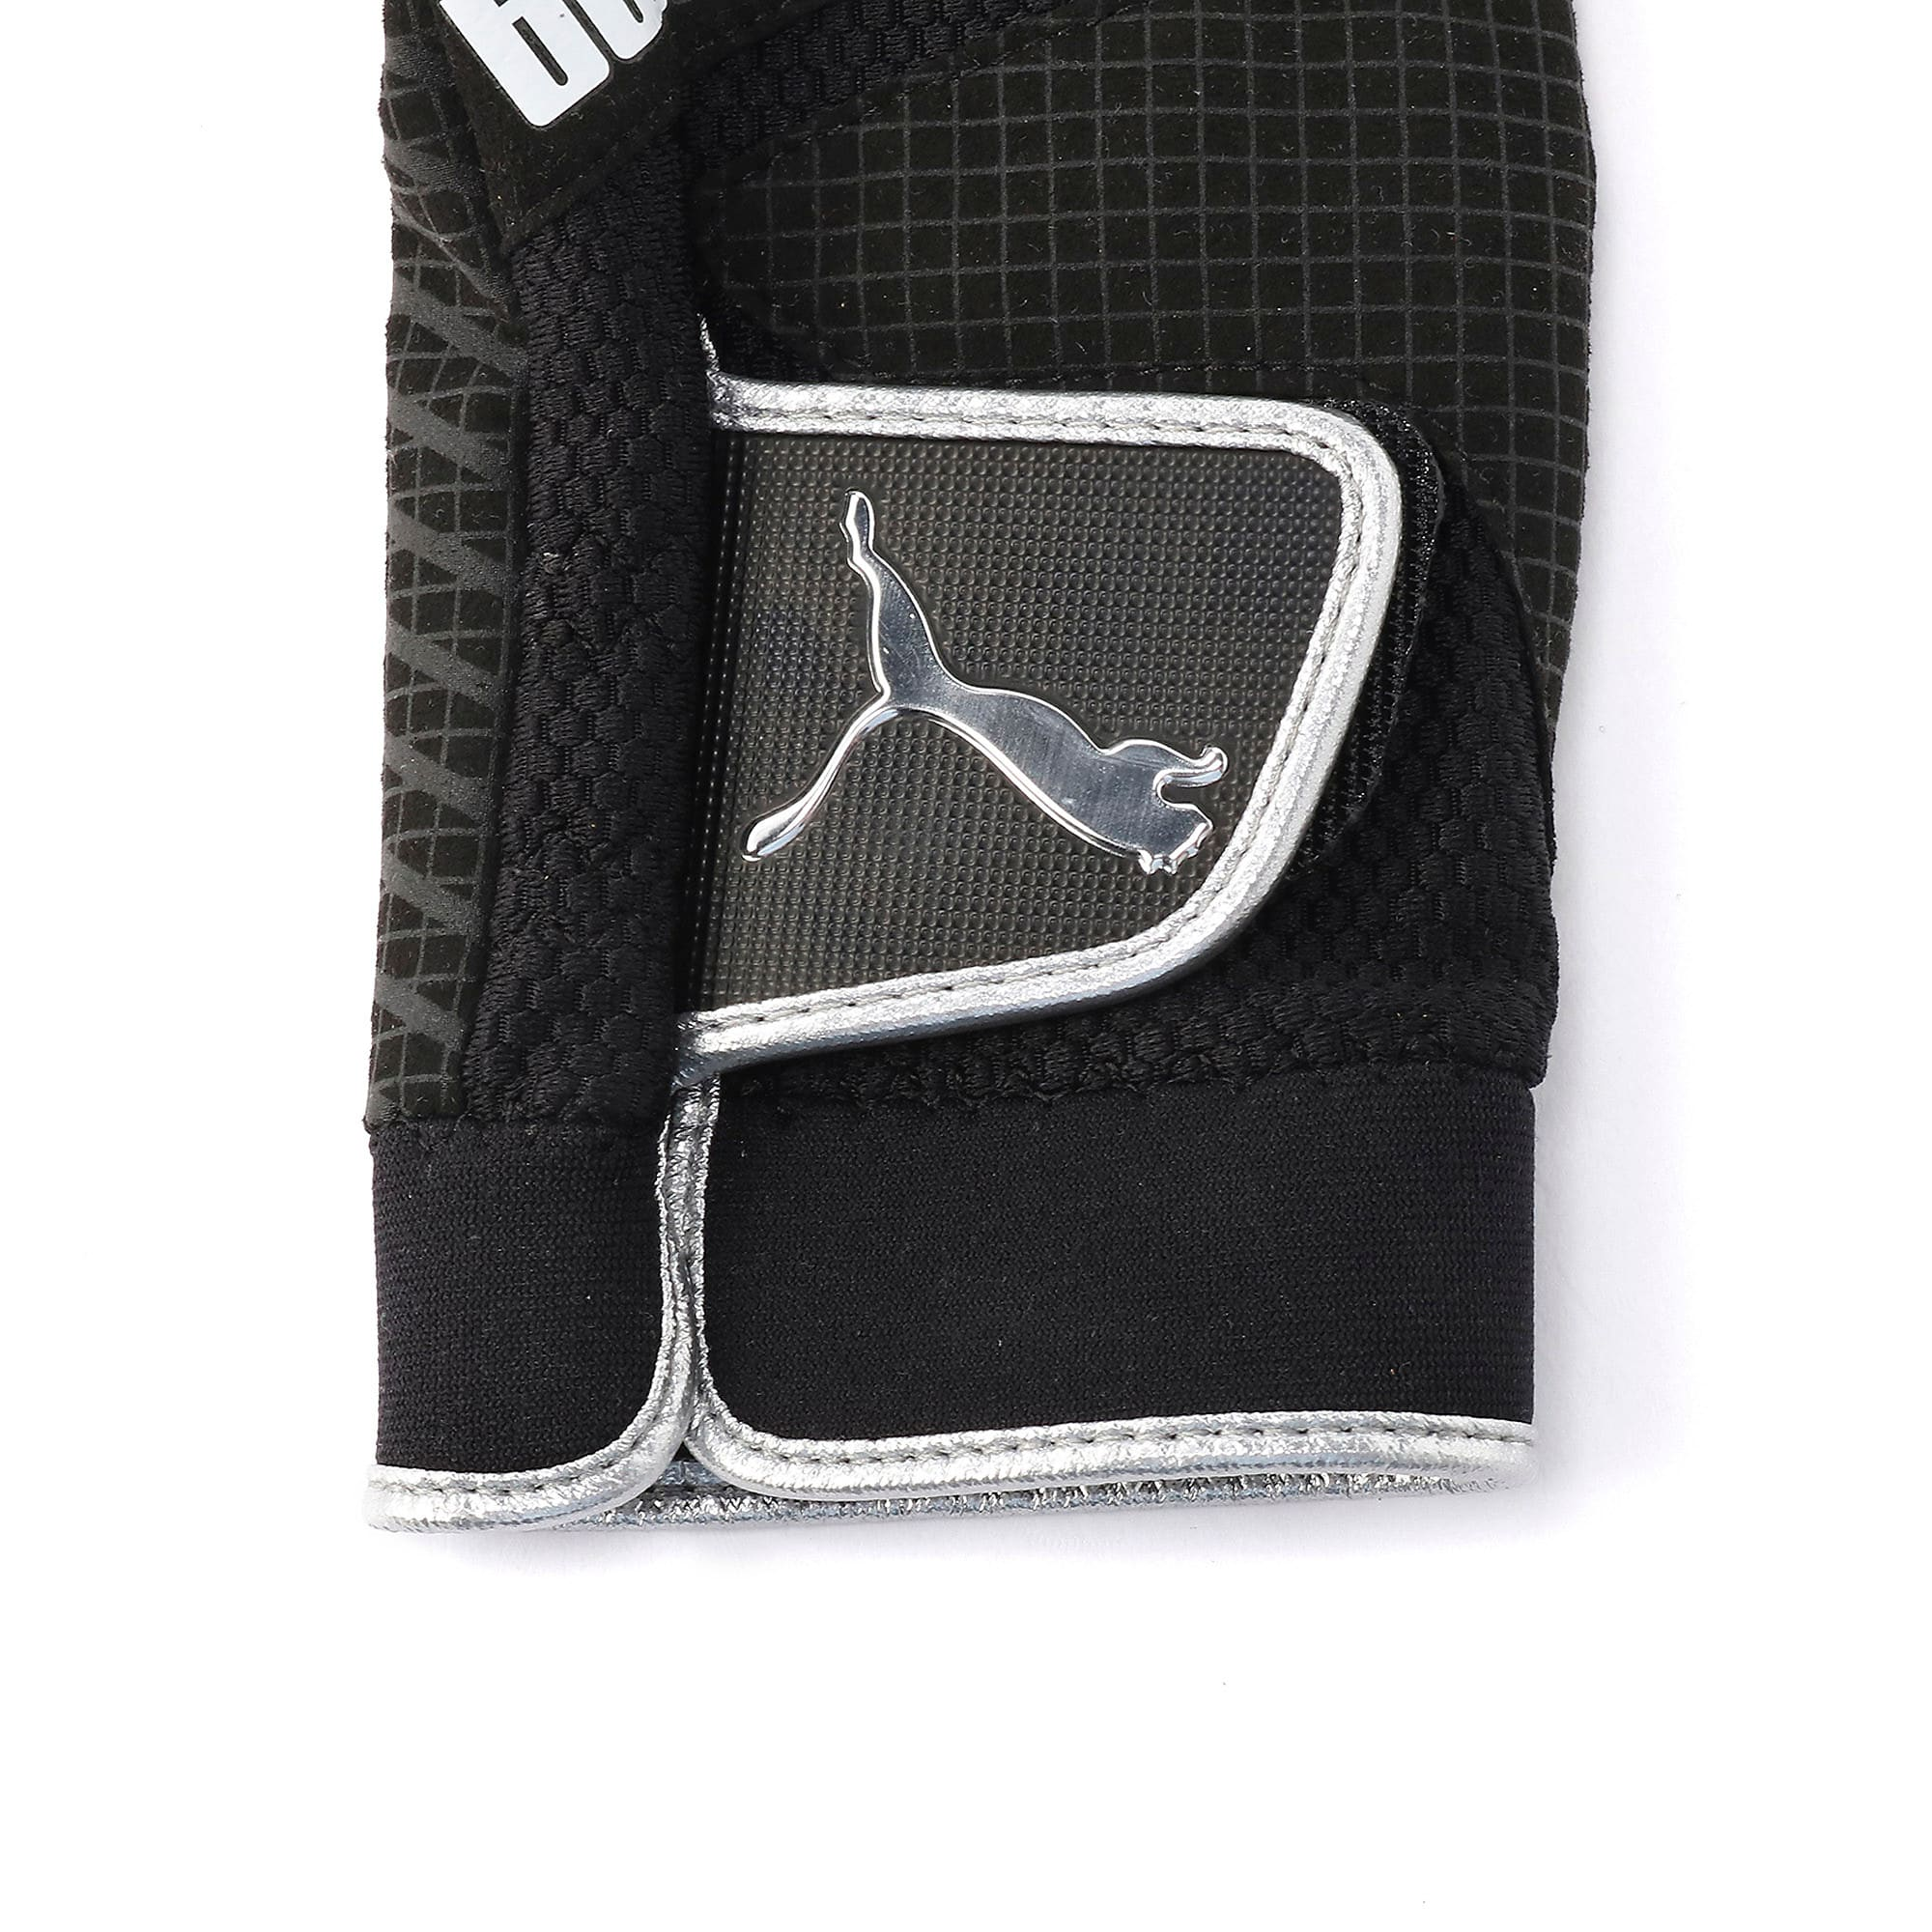 Thumbnail 5 of ゴルフ 3D ウィンター グローブ, Puma Black / Quarry, medium-JPN